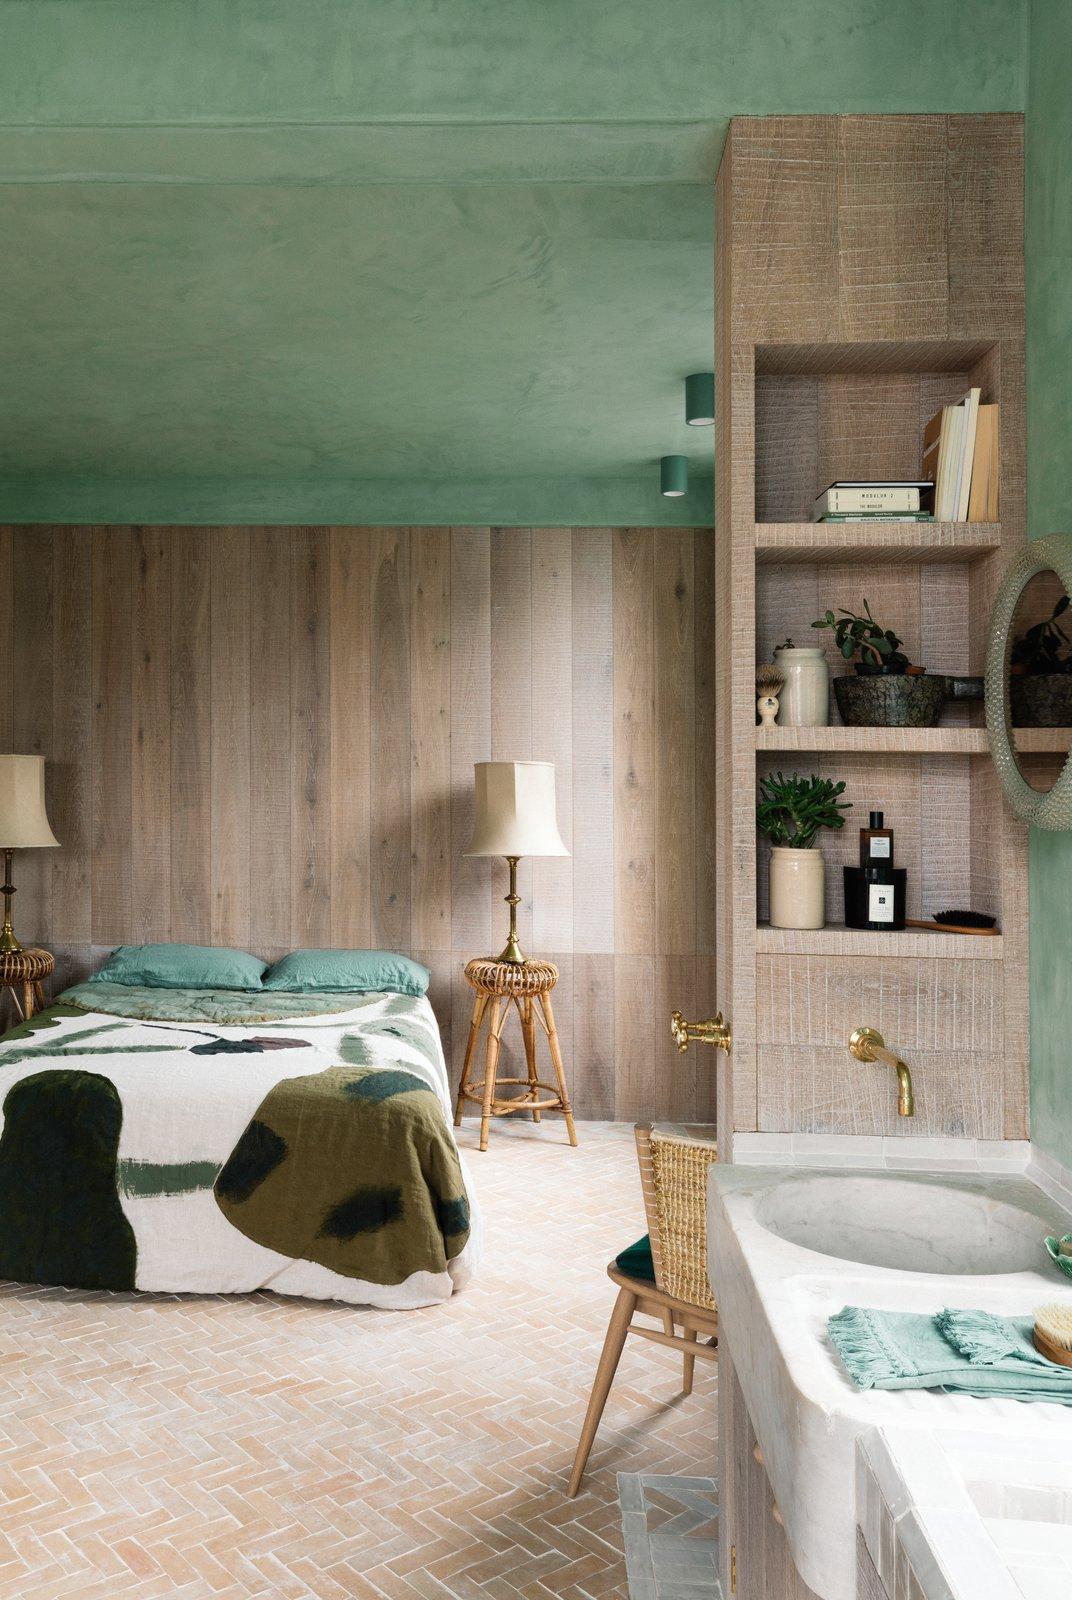 The Beldi Chan + Eayrs bedroom